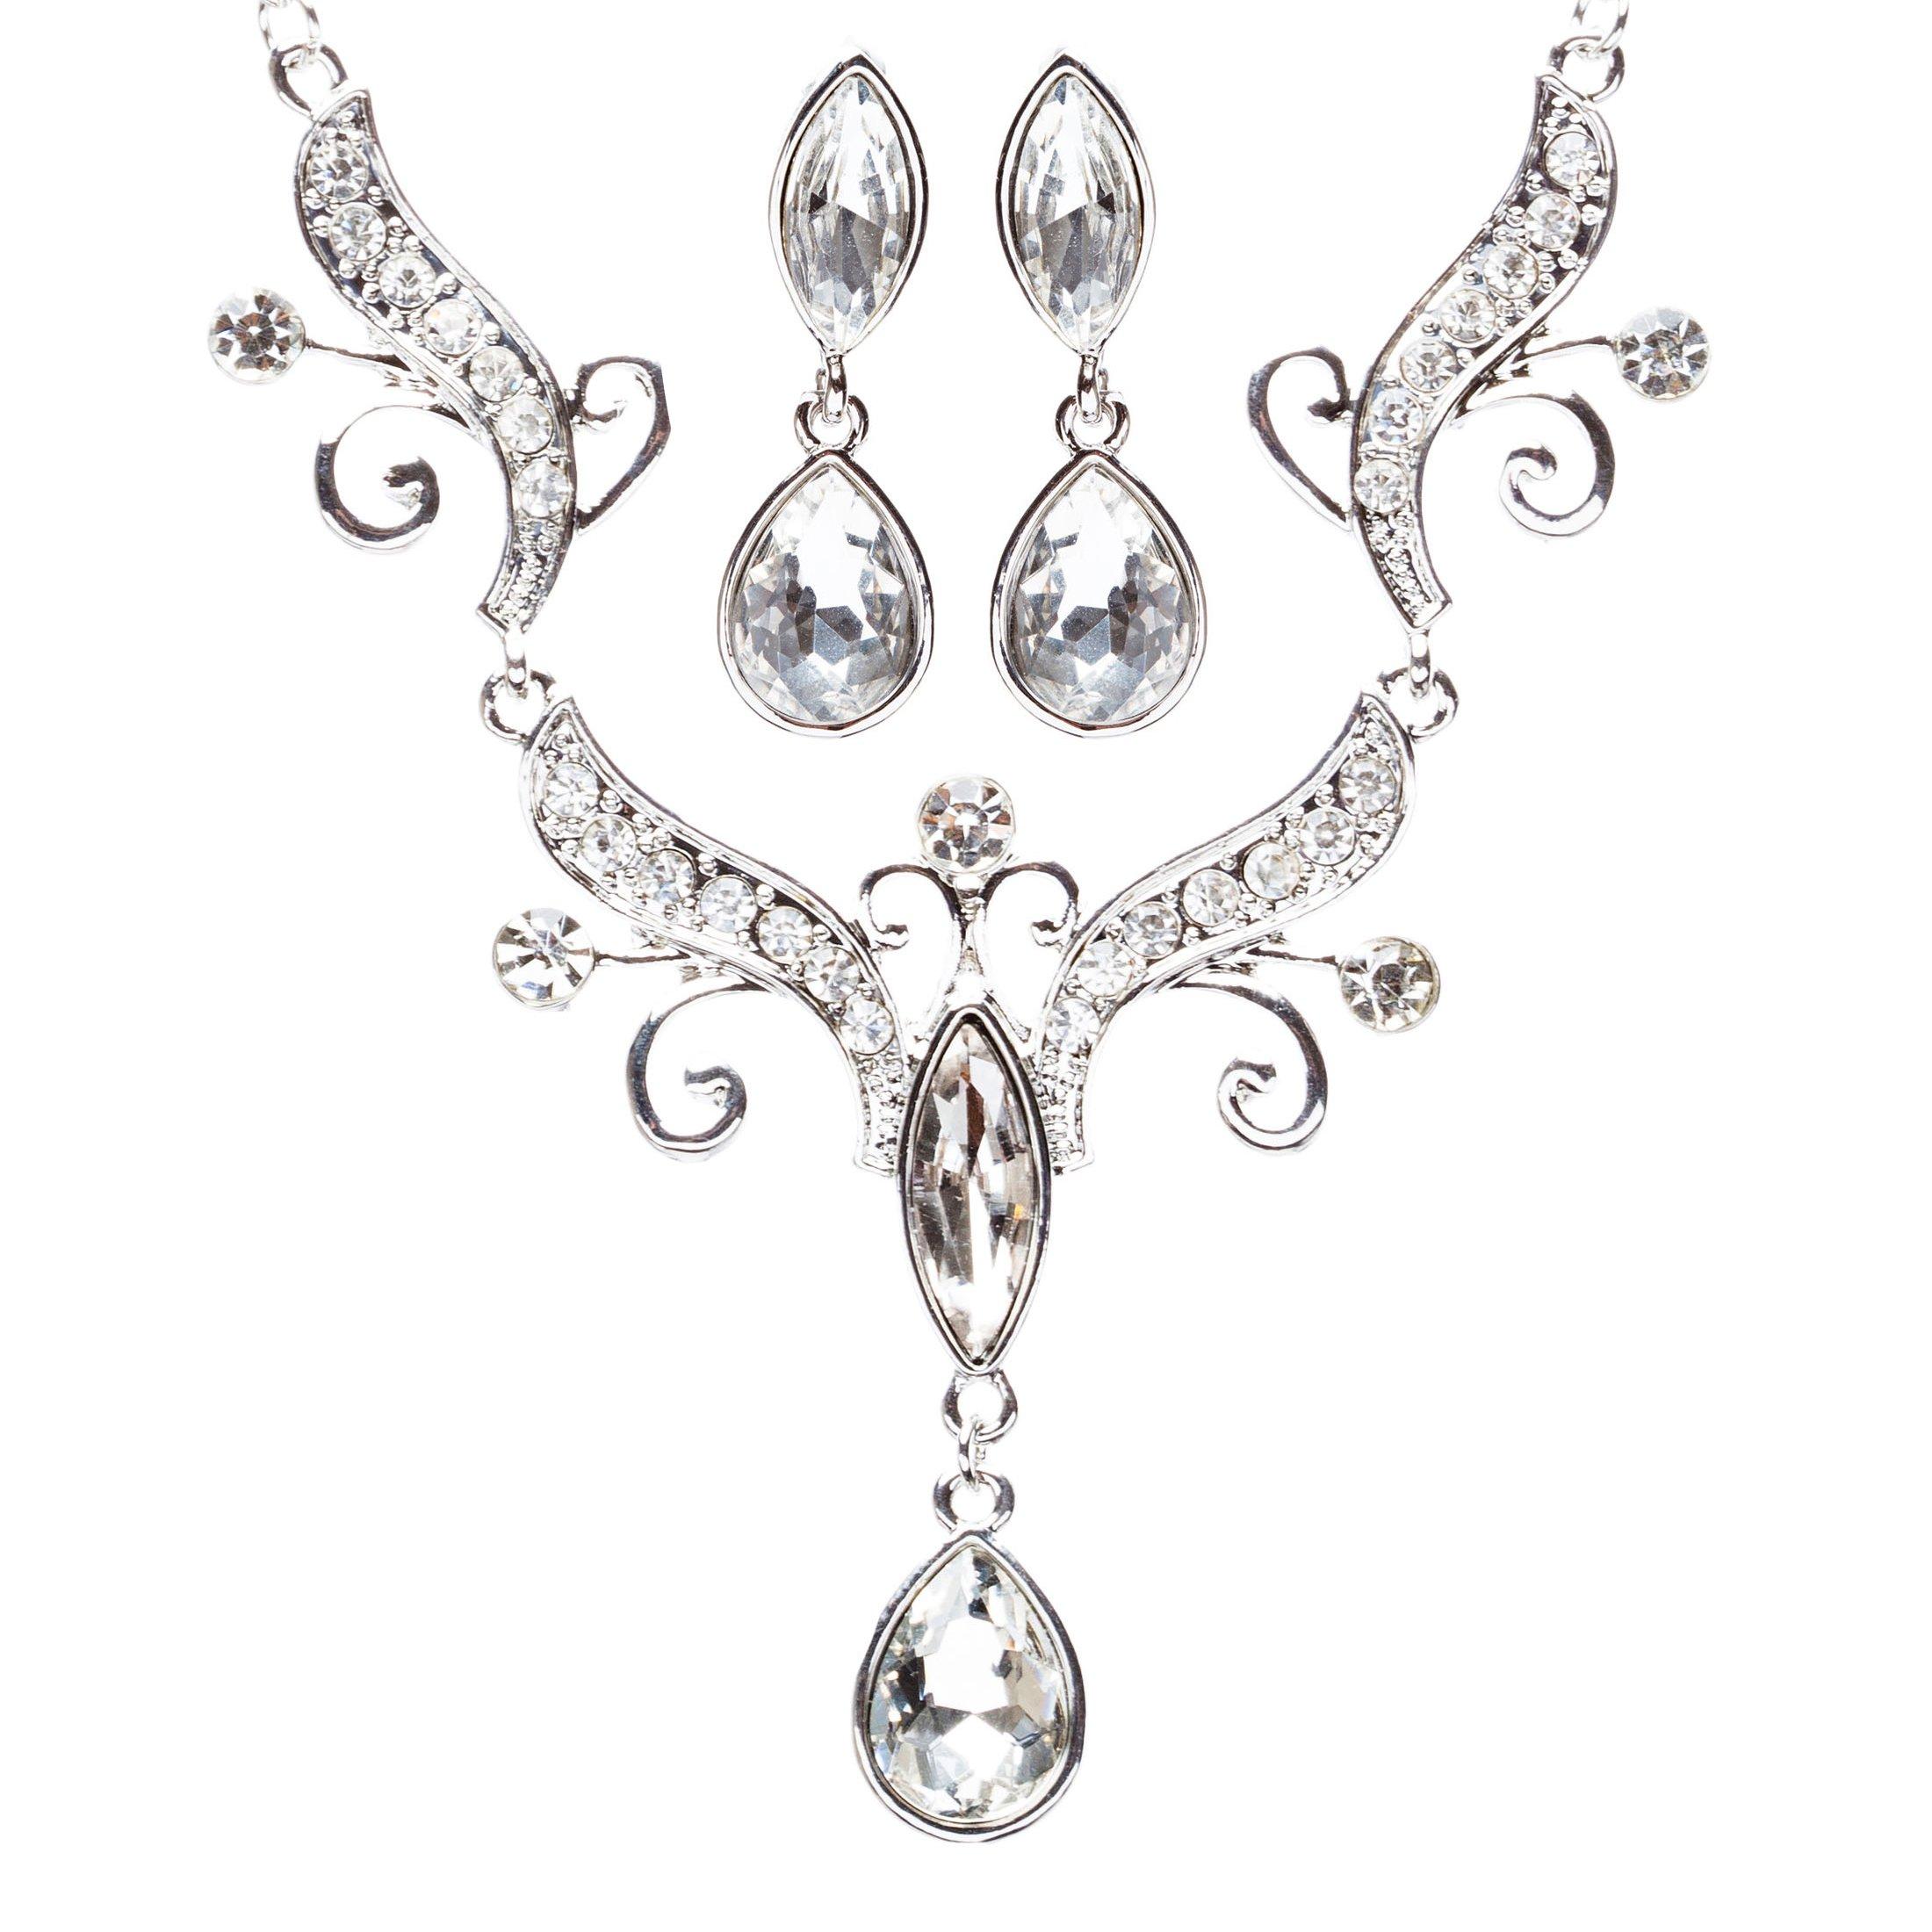 ACCESSORIESFOREVER Women Bridal Wedding Jewelry Crystal Rhinestone Dazzling Tear Drop Necklace J570Silver